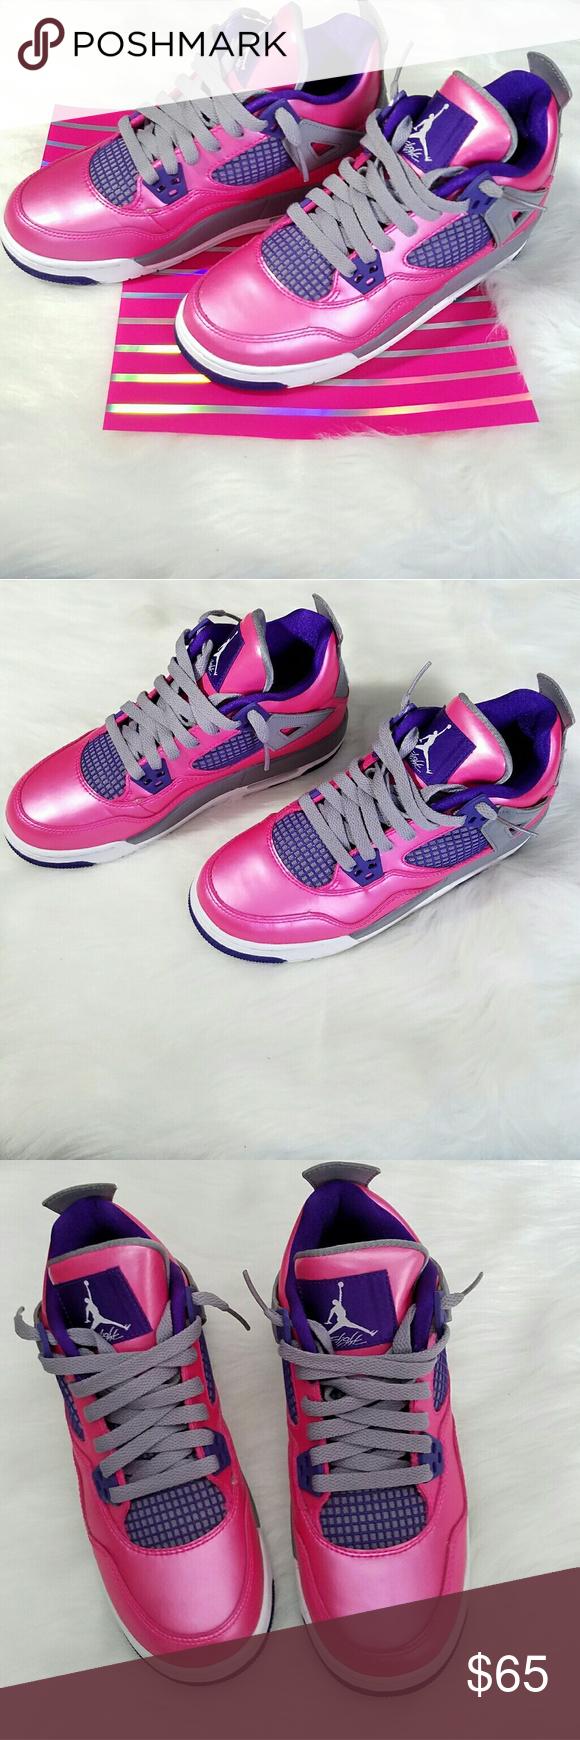 8ba6e51034a Spotted while shopping on Poshmark  Nike Air Retro 4 Jordan s Girls Size  4.5Y Youth!  poshmark  fashion  shopping  style  Jordan  Other